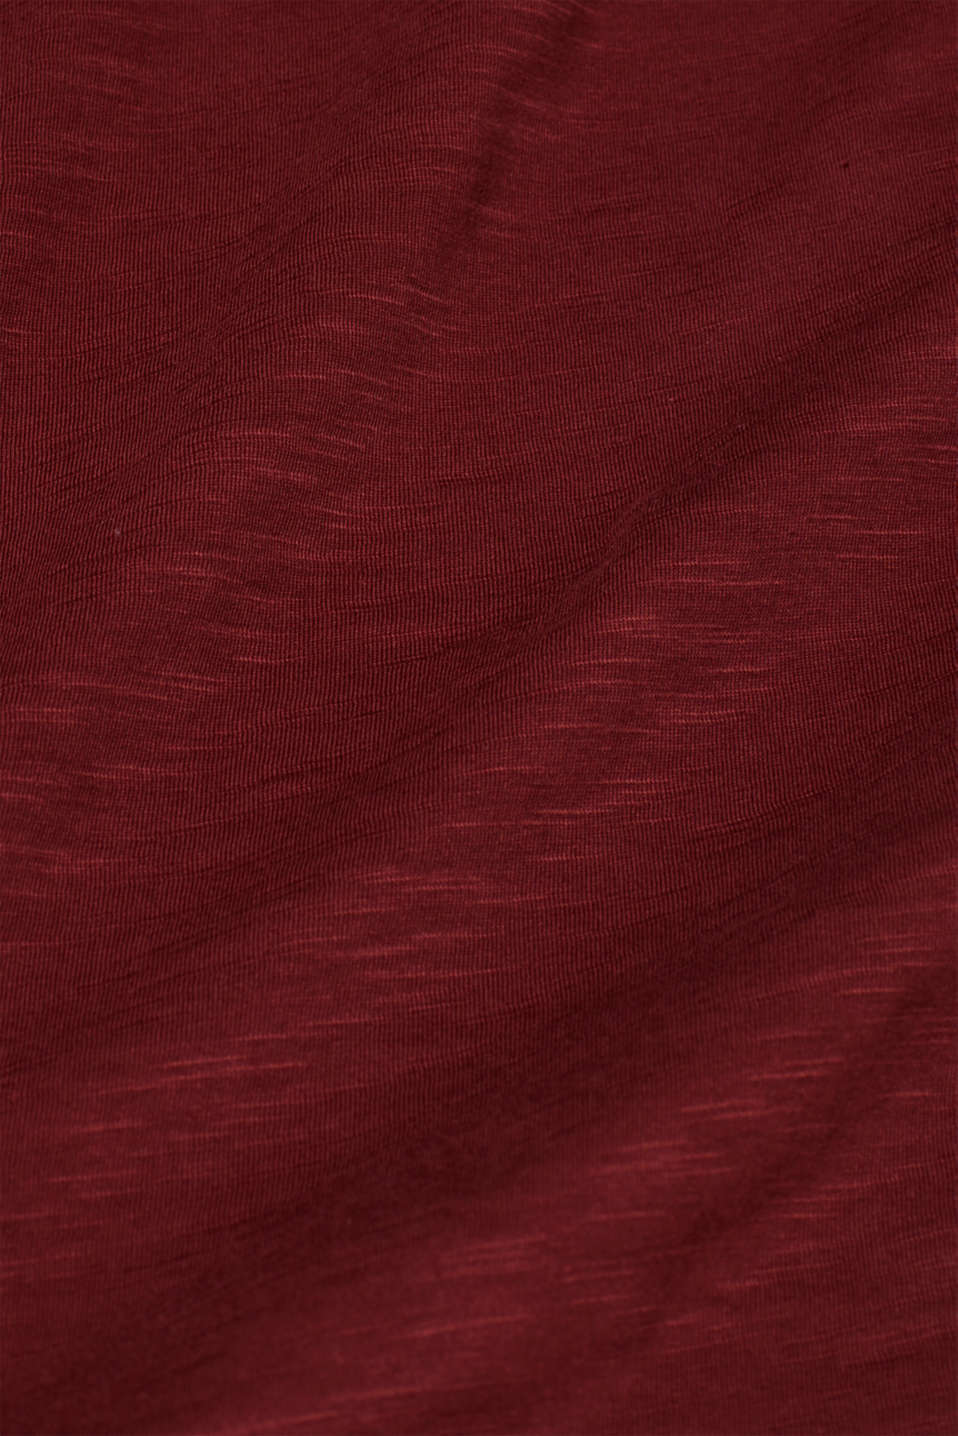 Slub jersey T-shirt in 100% cotton, TERRACOTTA, detail image number 4